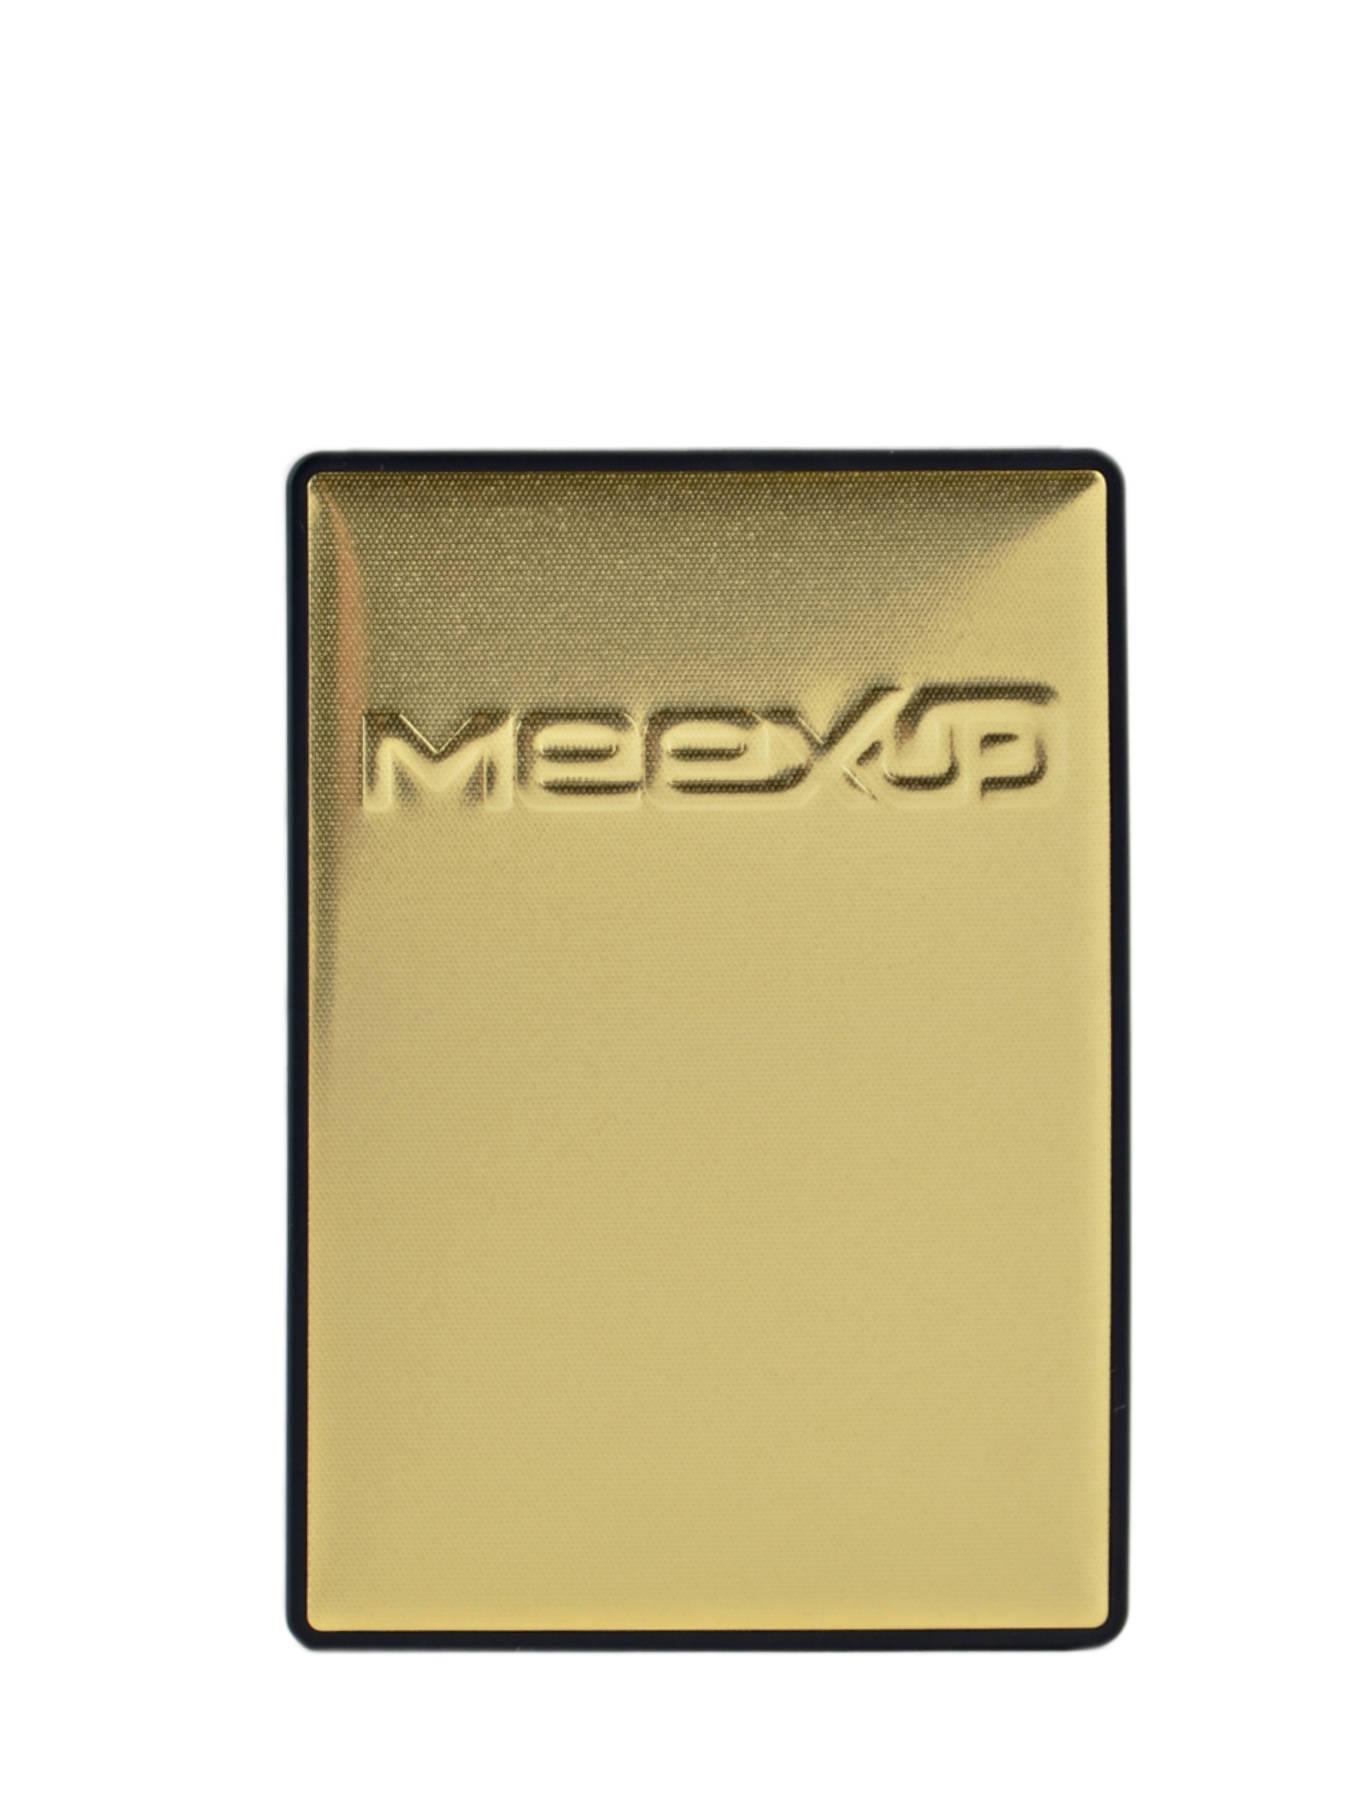 MEEXUP Porte-cartes 6 Cartes Meexup Or